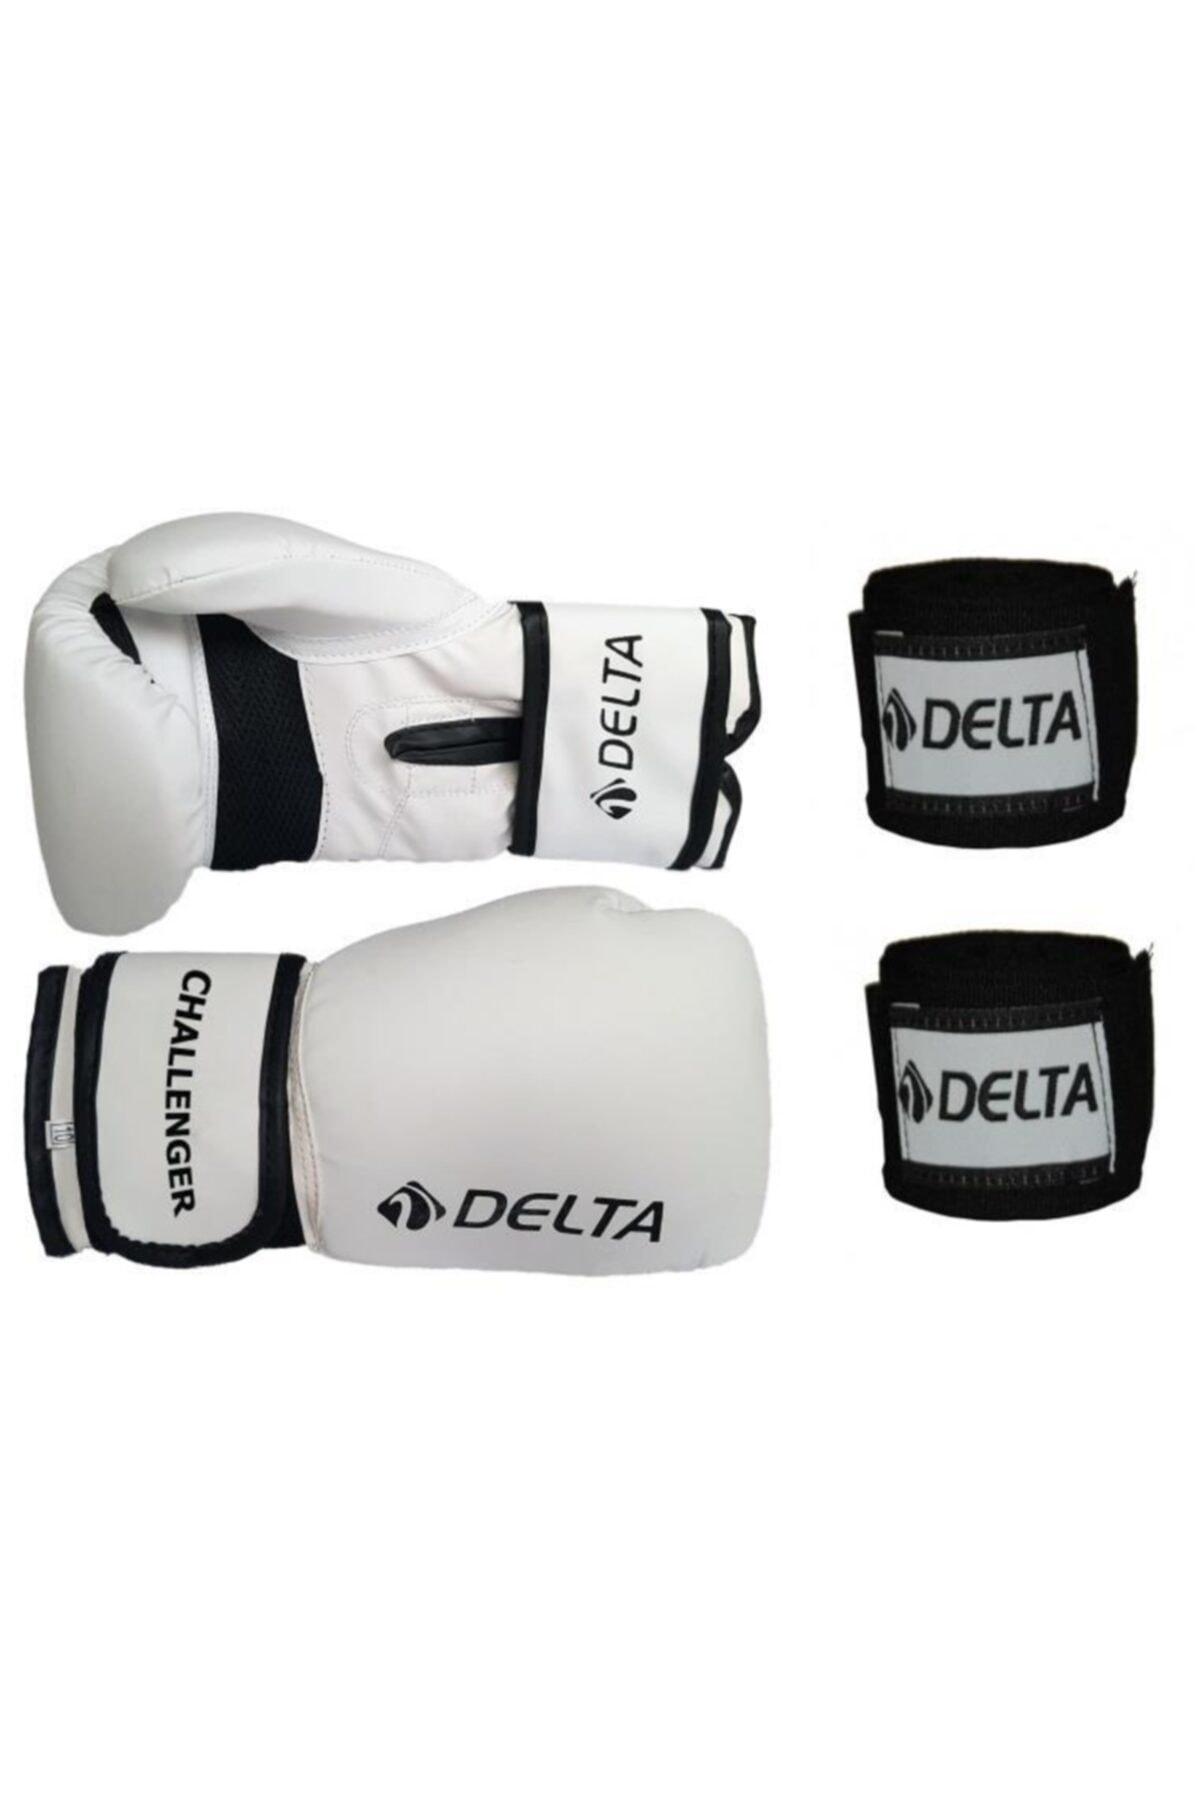 Delta Challenger Dura-strong Boks Eldiveni ve Boks El Bandajı Seti 1